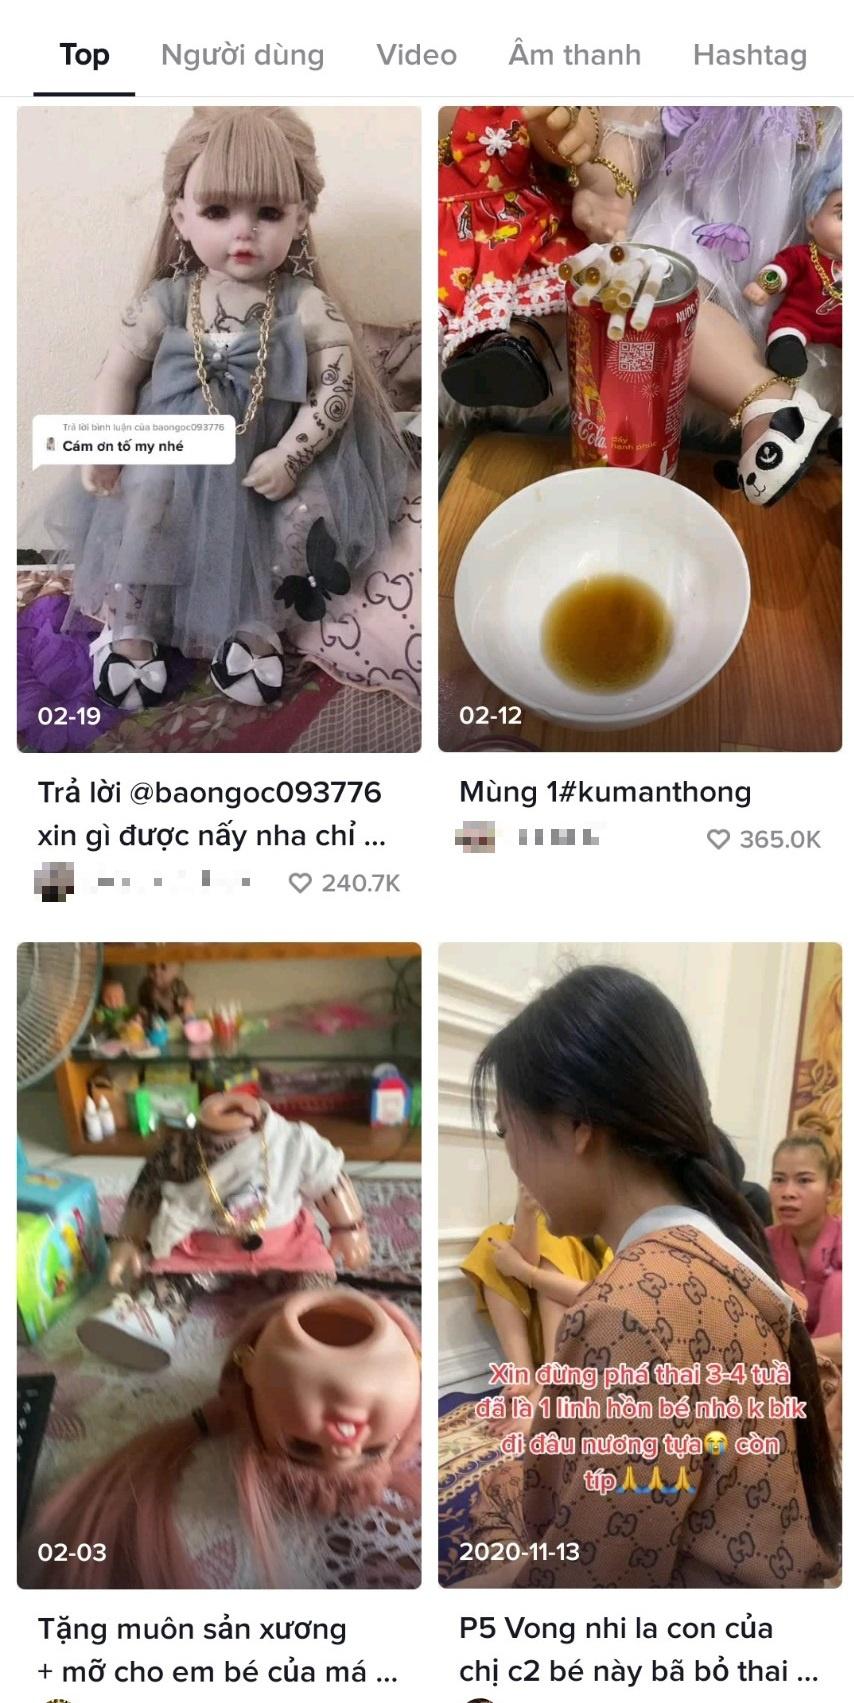 Tho Nguyen phoi bay chinh sach long leo cua TikTok anh 3